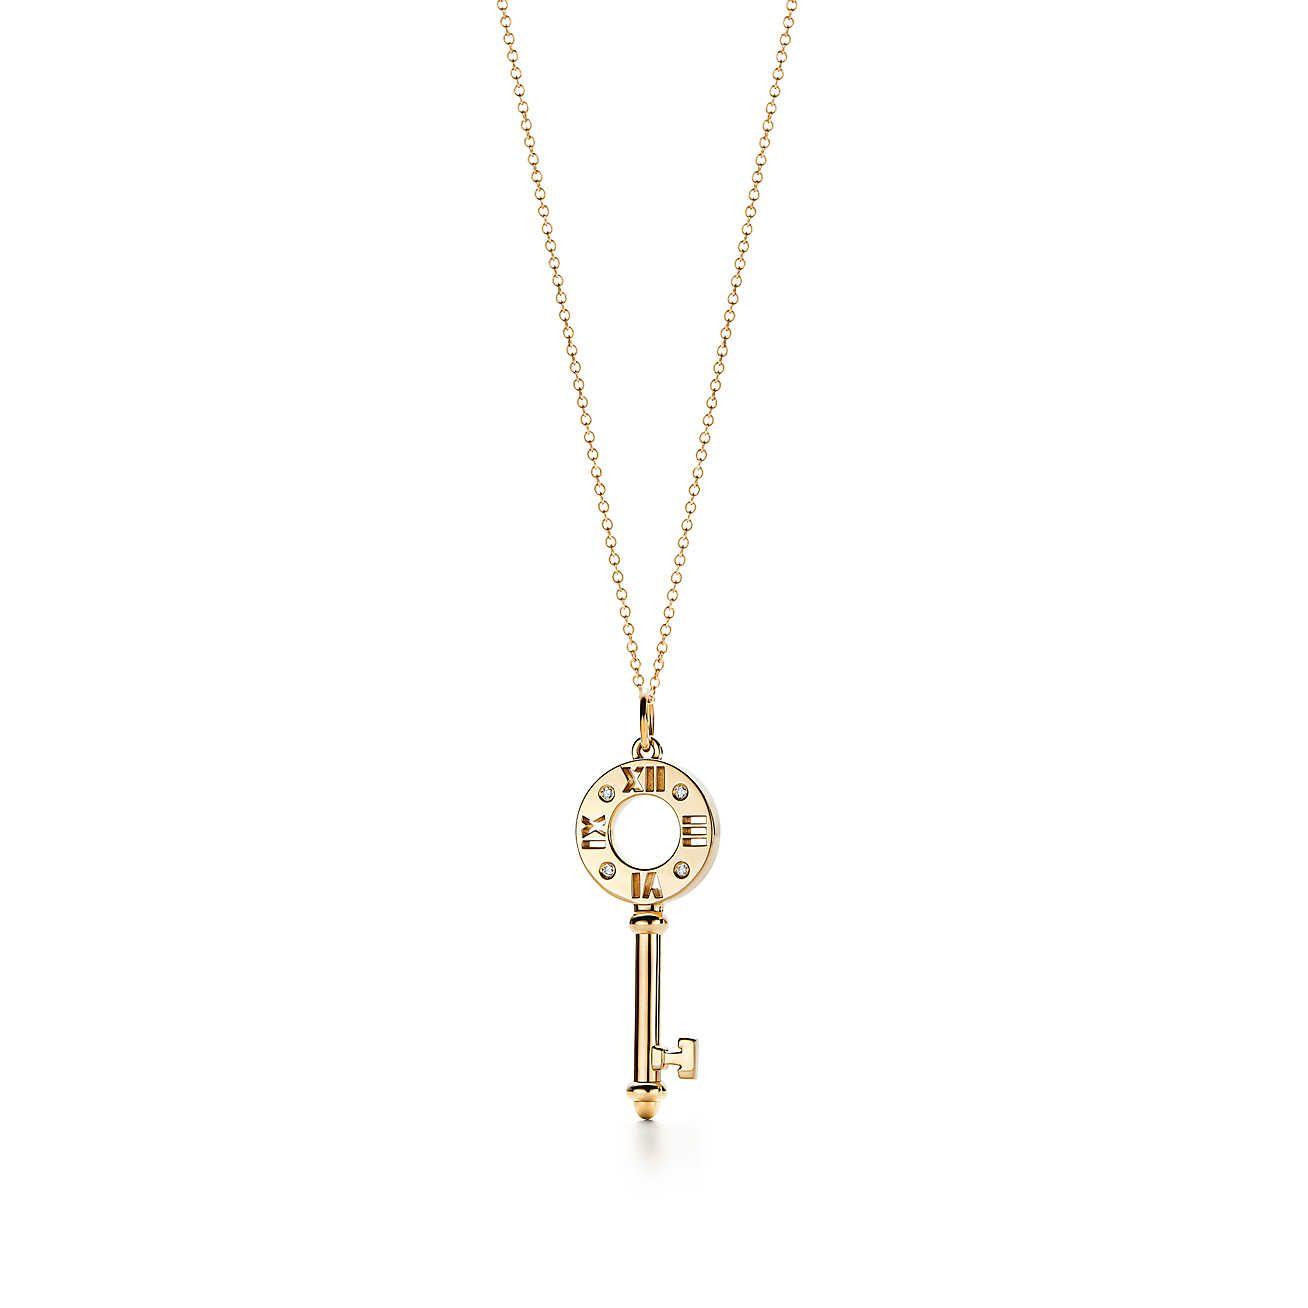 efdd413348c0d Atlas® Pierced Key in 2019 | A Wife's Wish List | Tiffany key ...